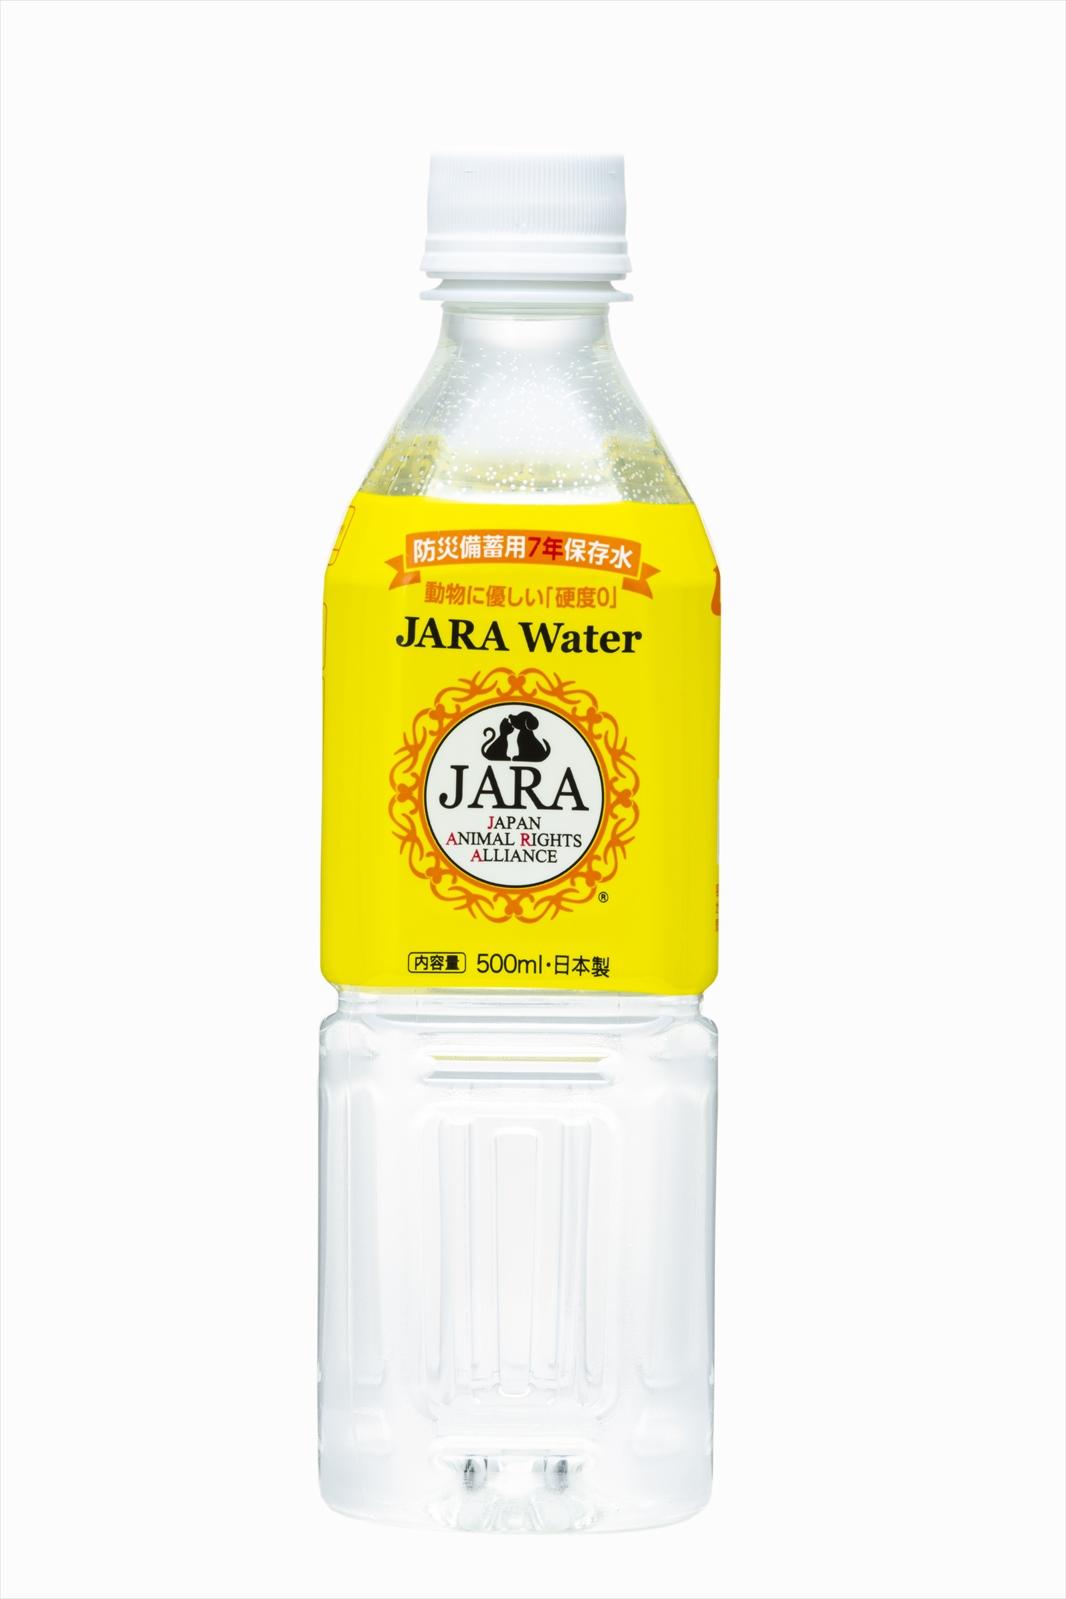 JARA Water ペット用防災備蓄7年保存水 500ml×24本入り